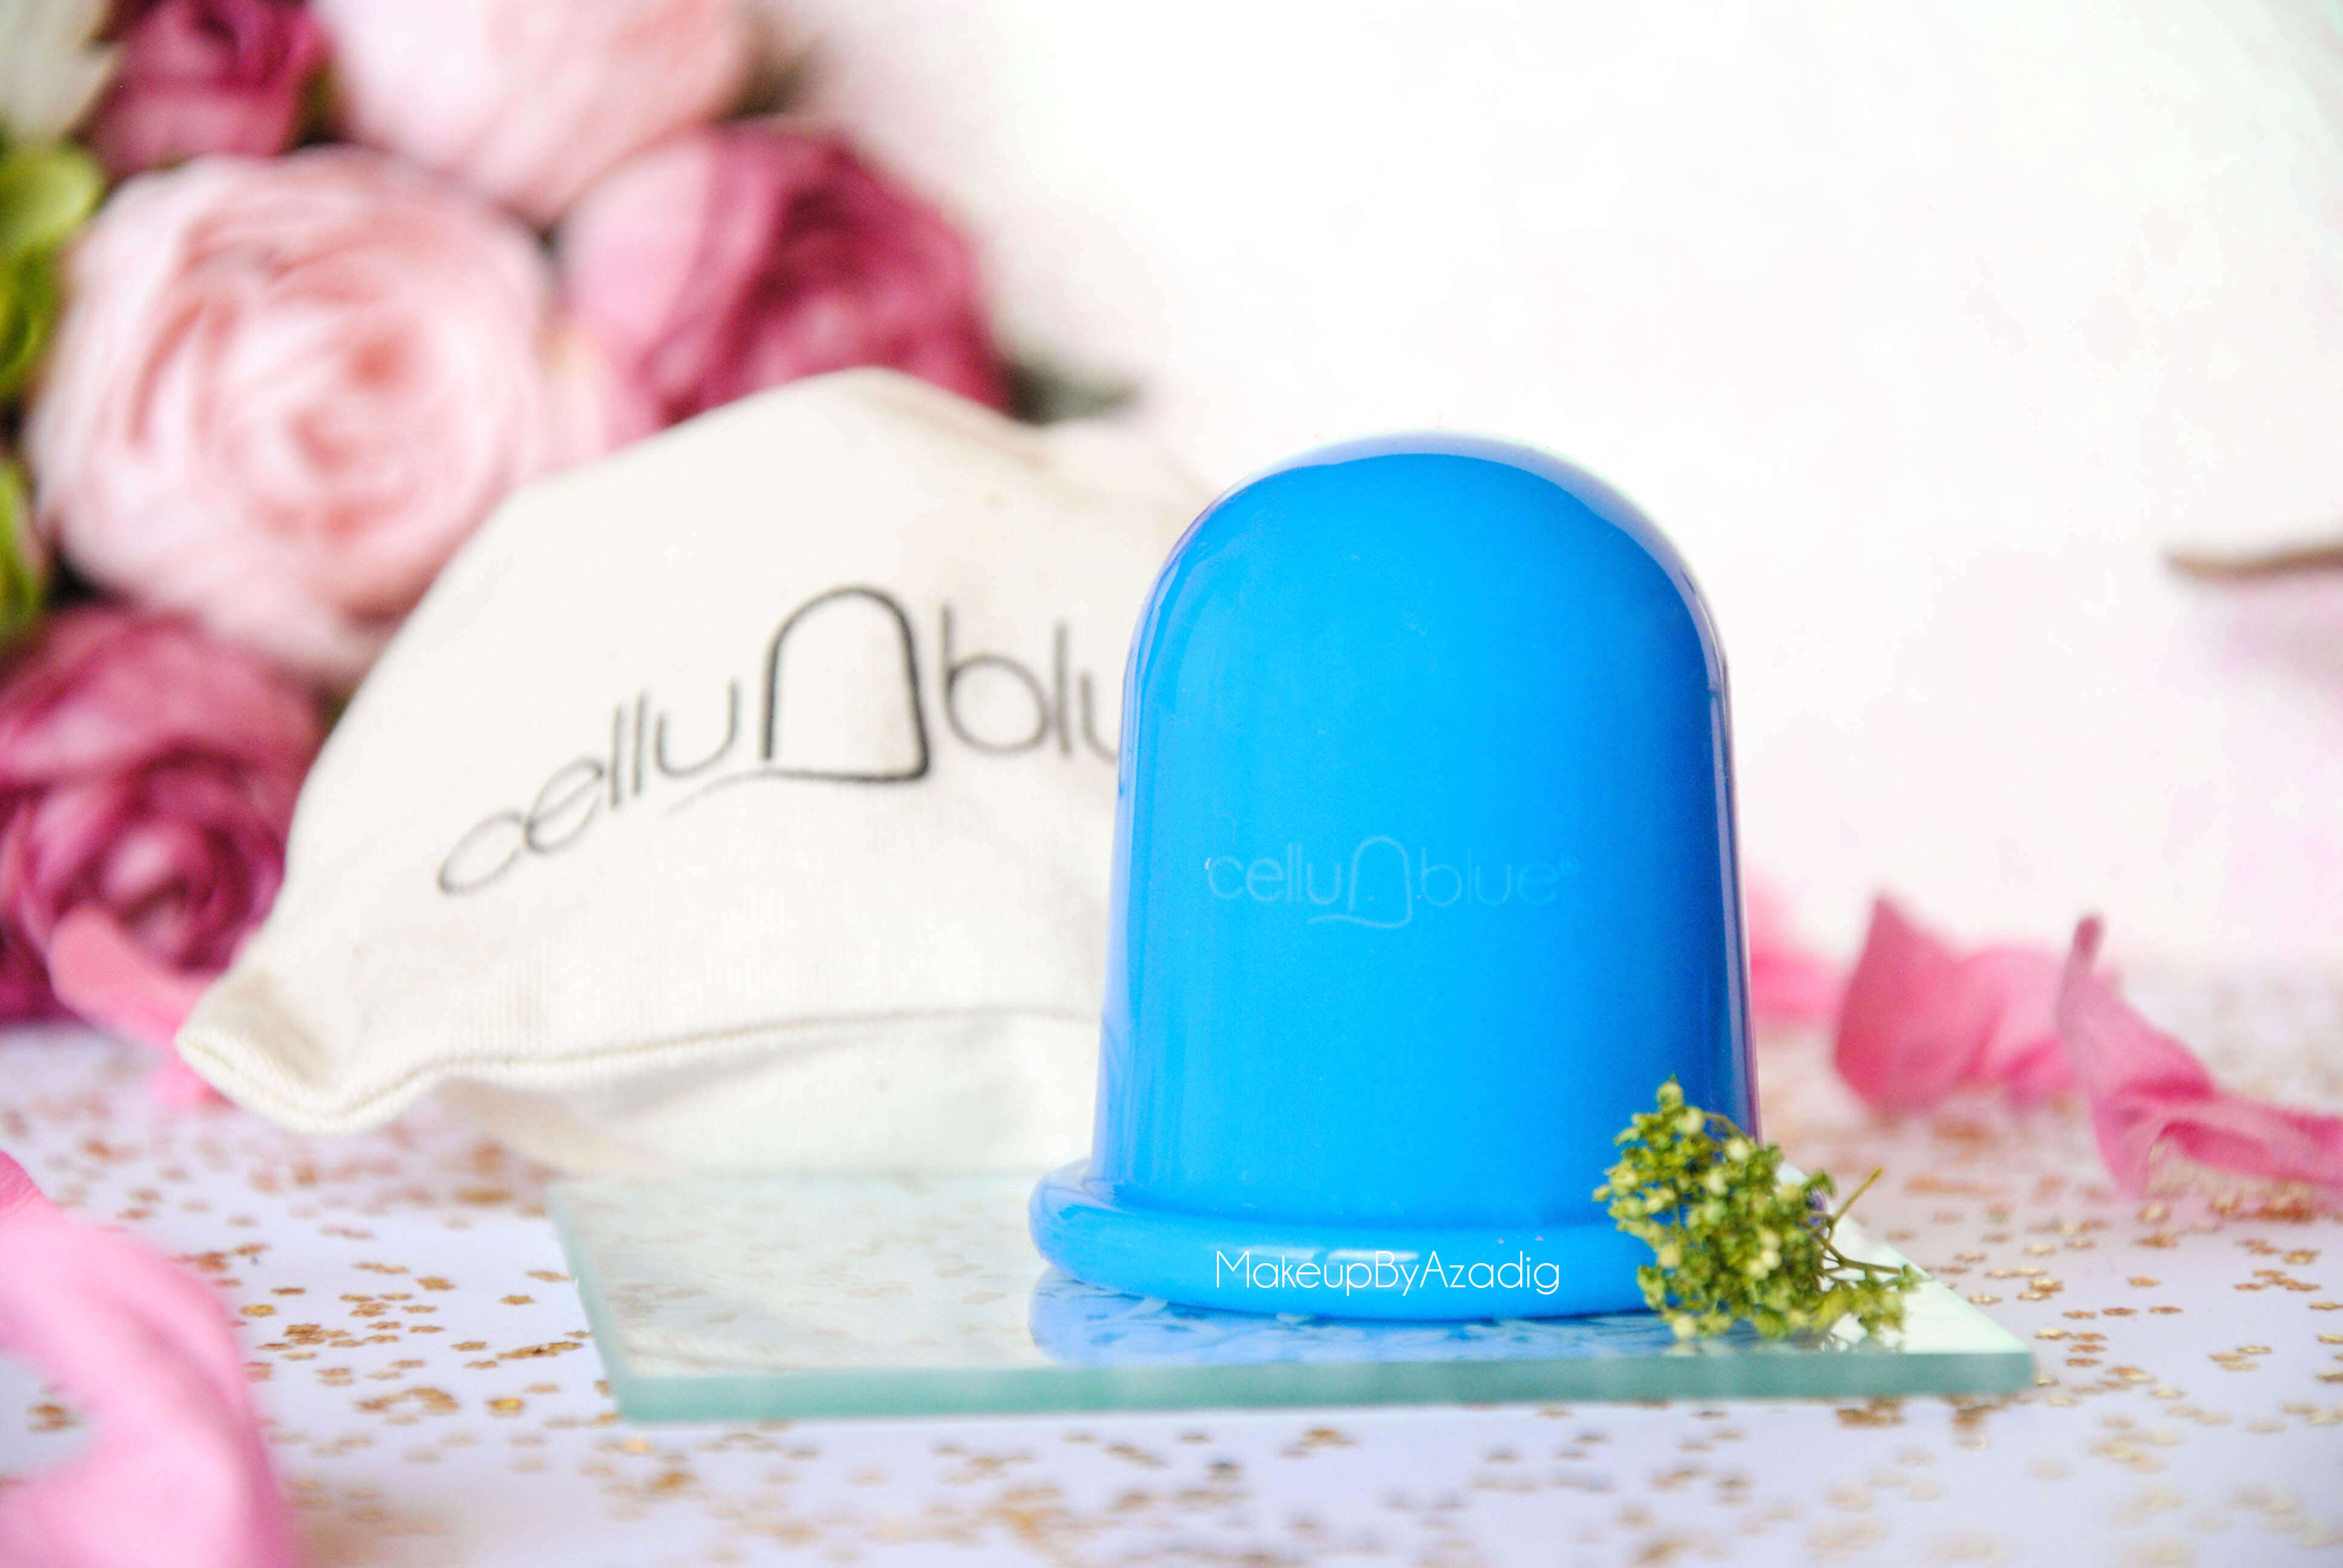 makeupbyazadig-cellublue-ventouse anti cellulite-avis-paris